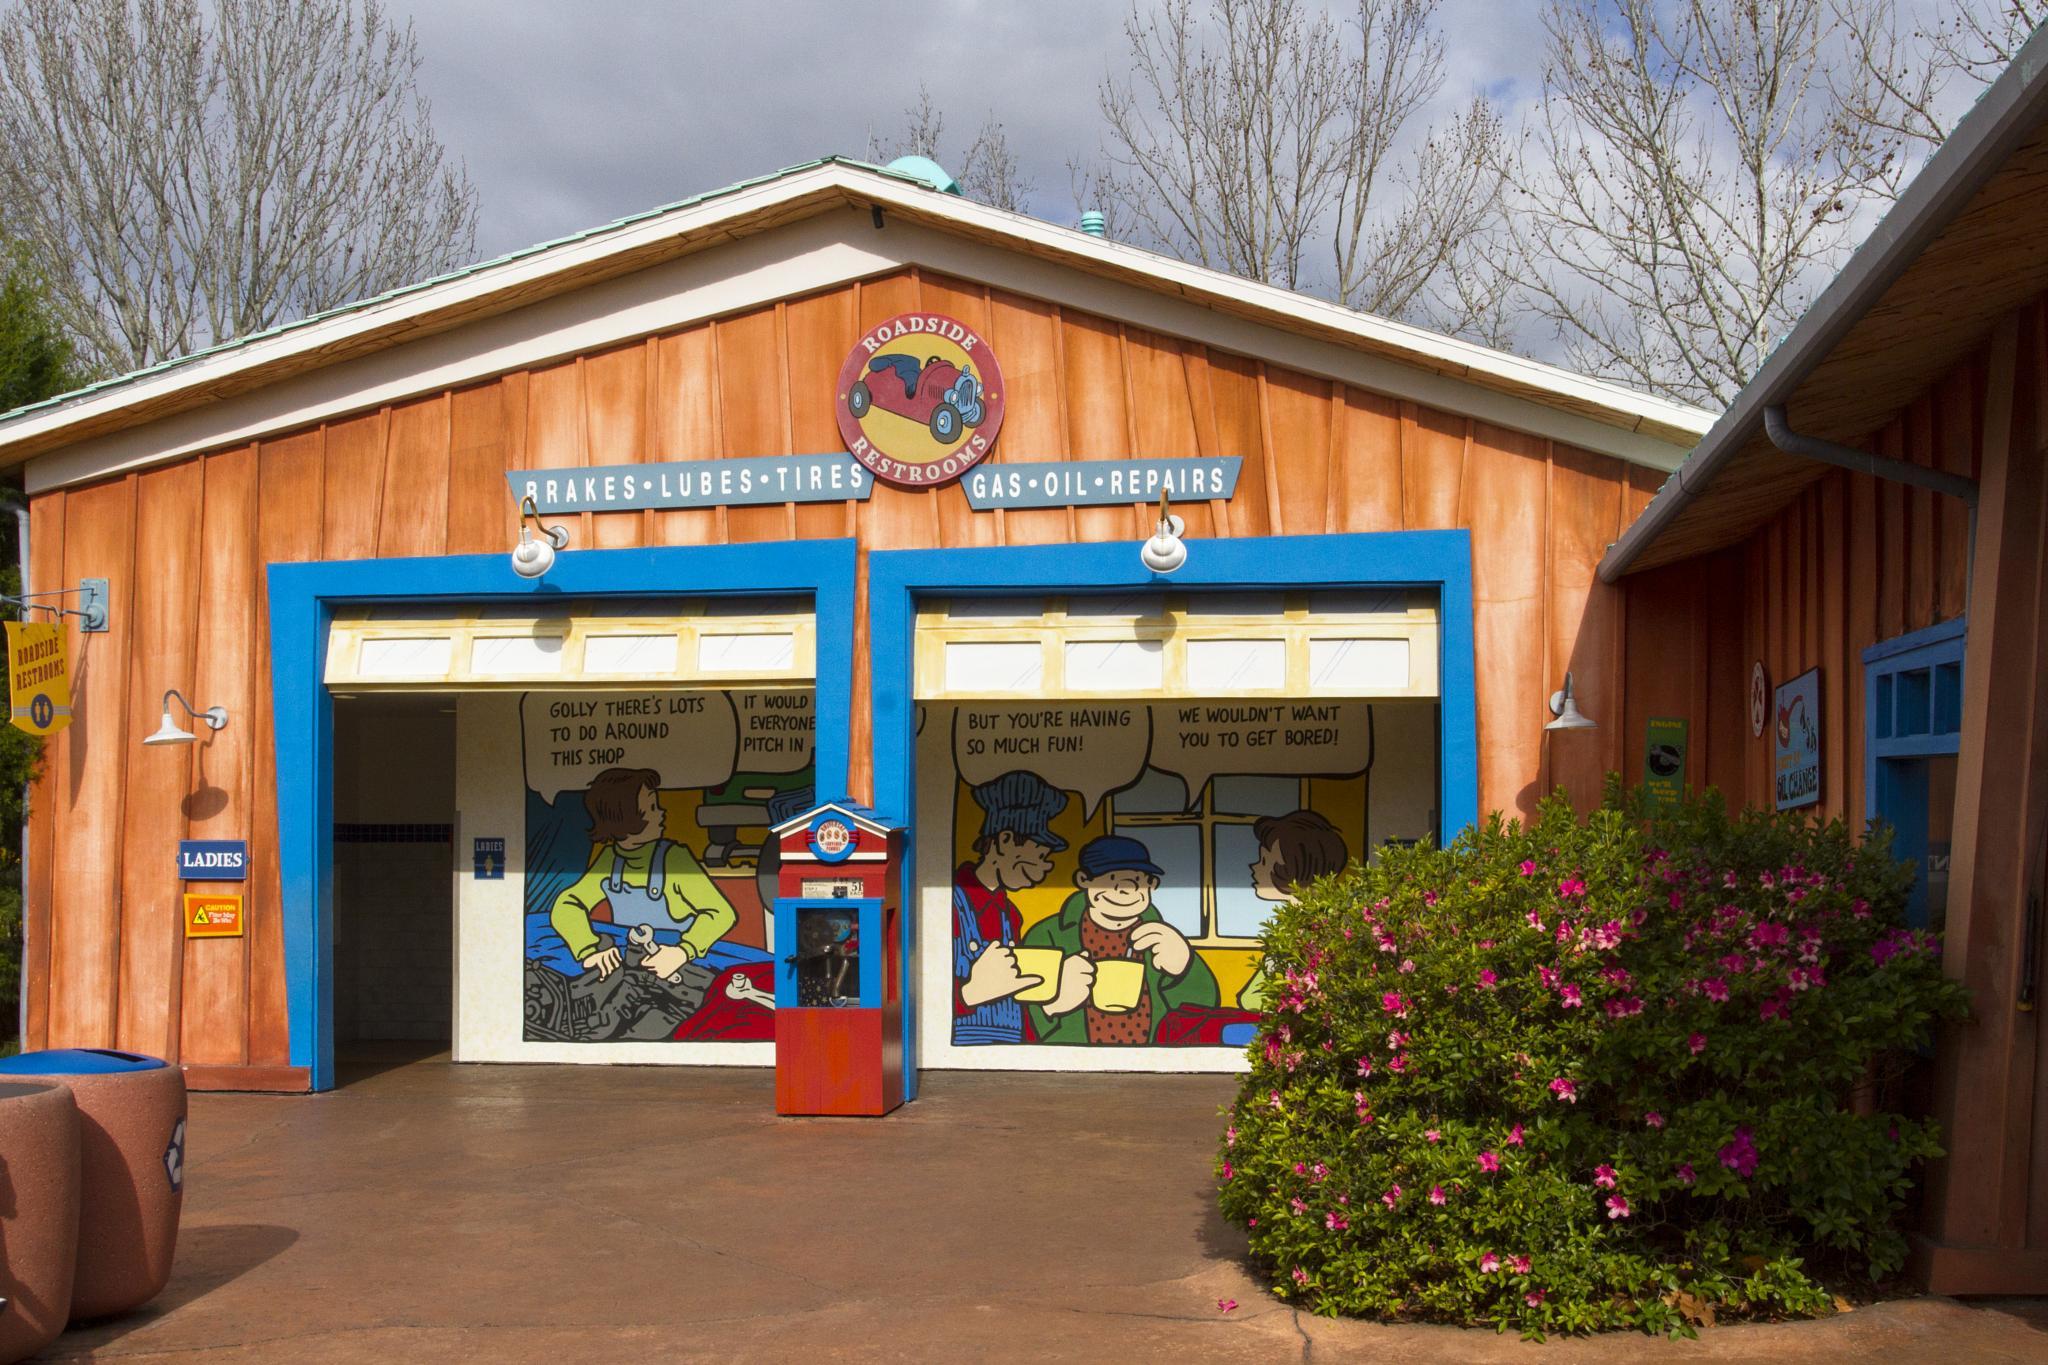 Garage Universal Orlando by Joe Chrvala